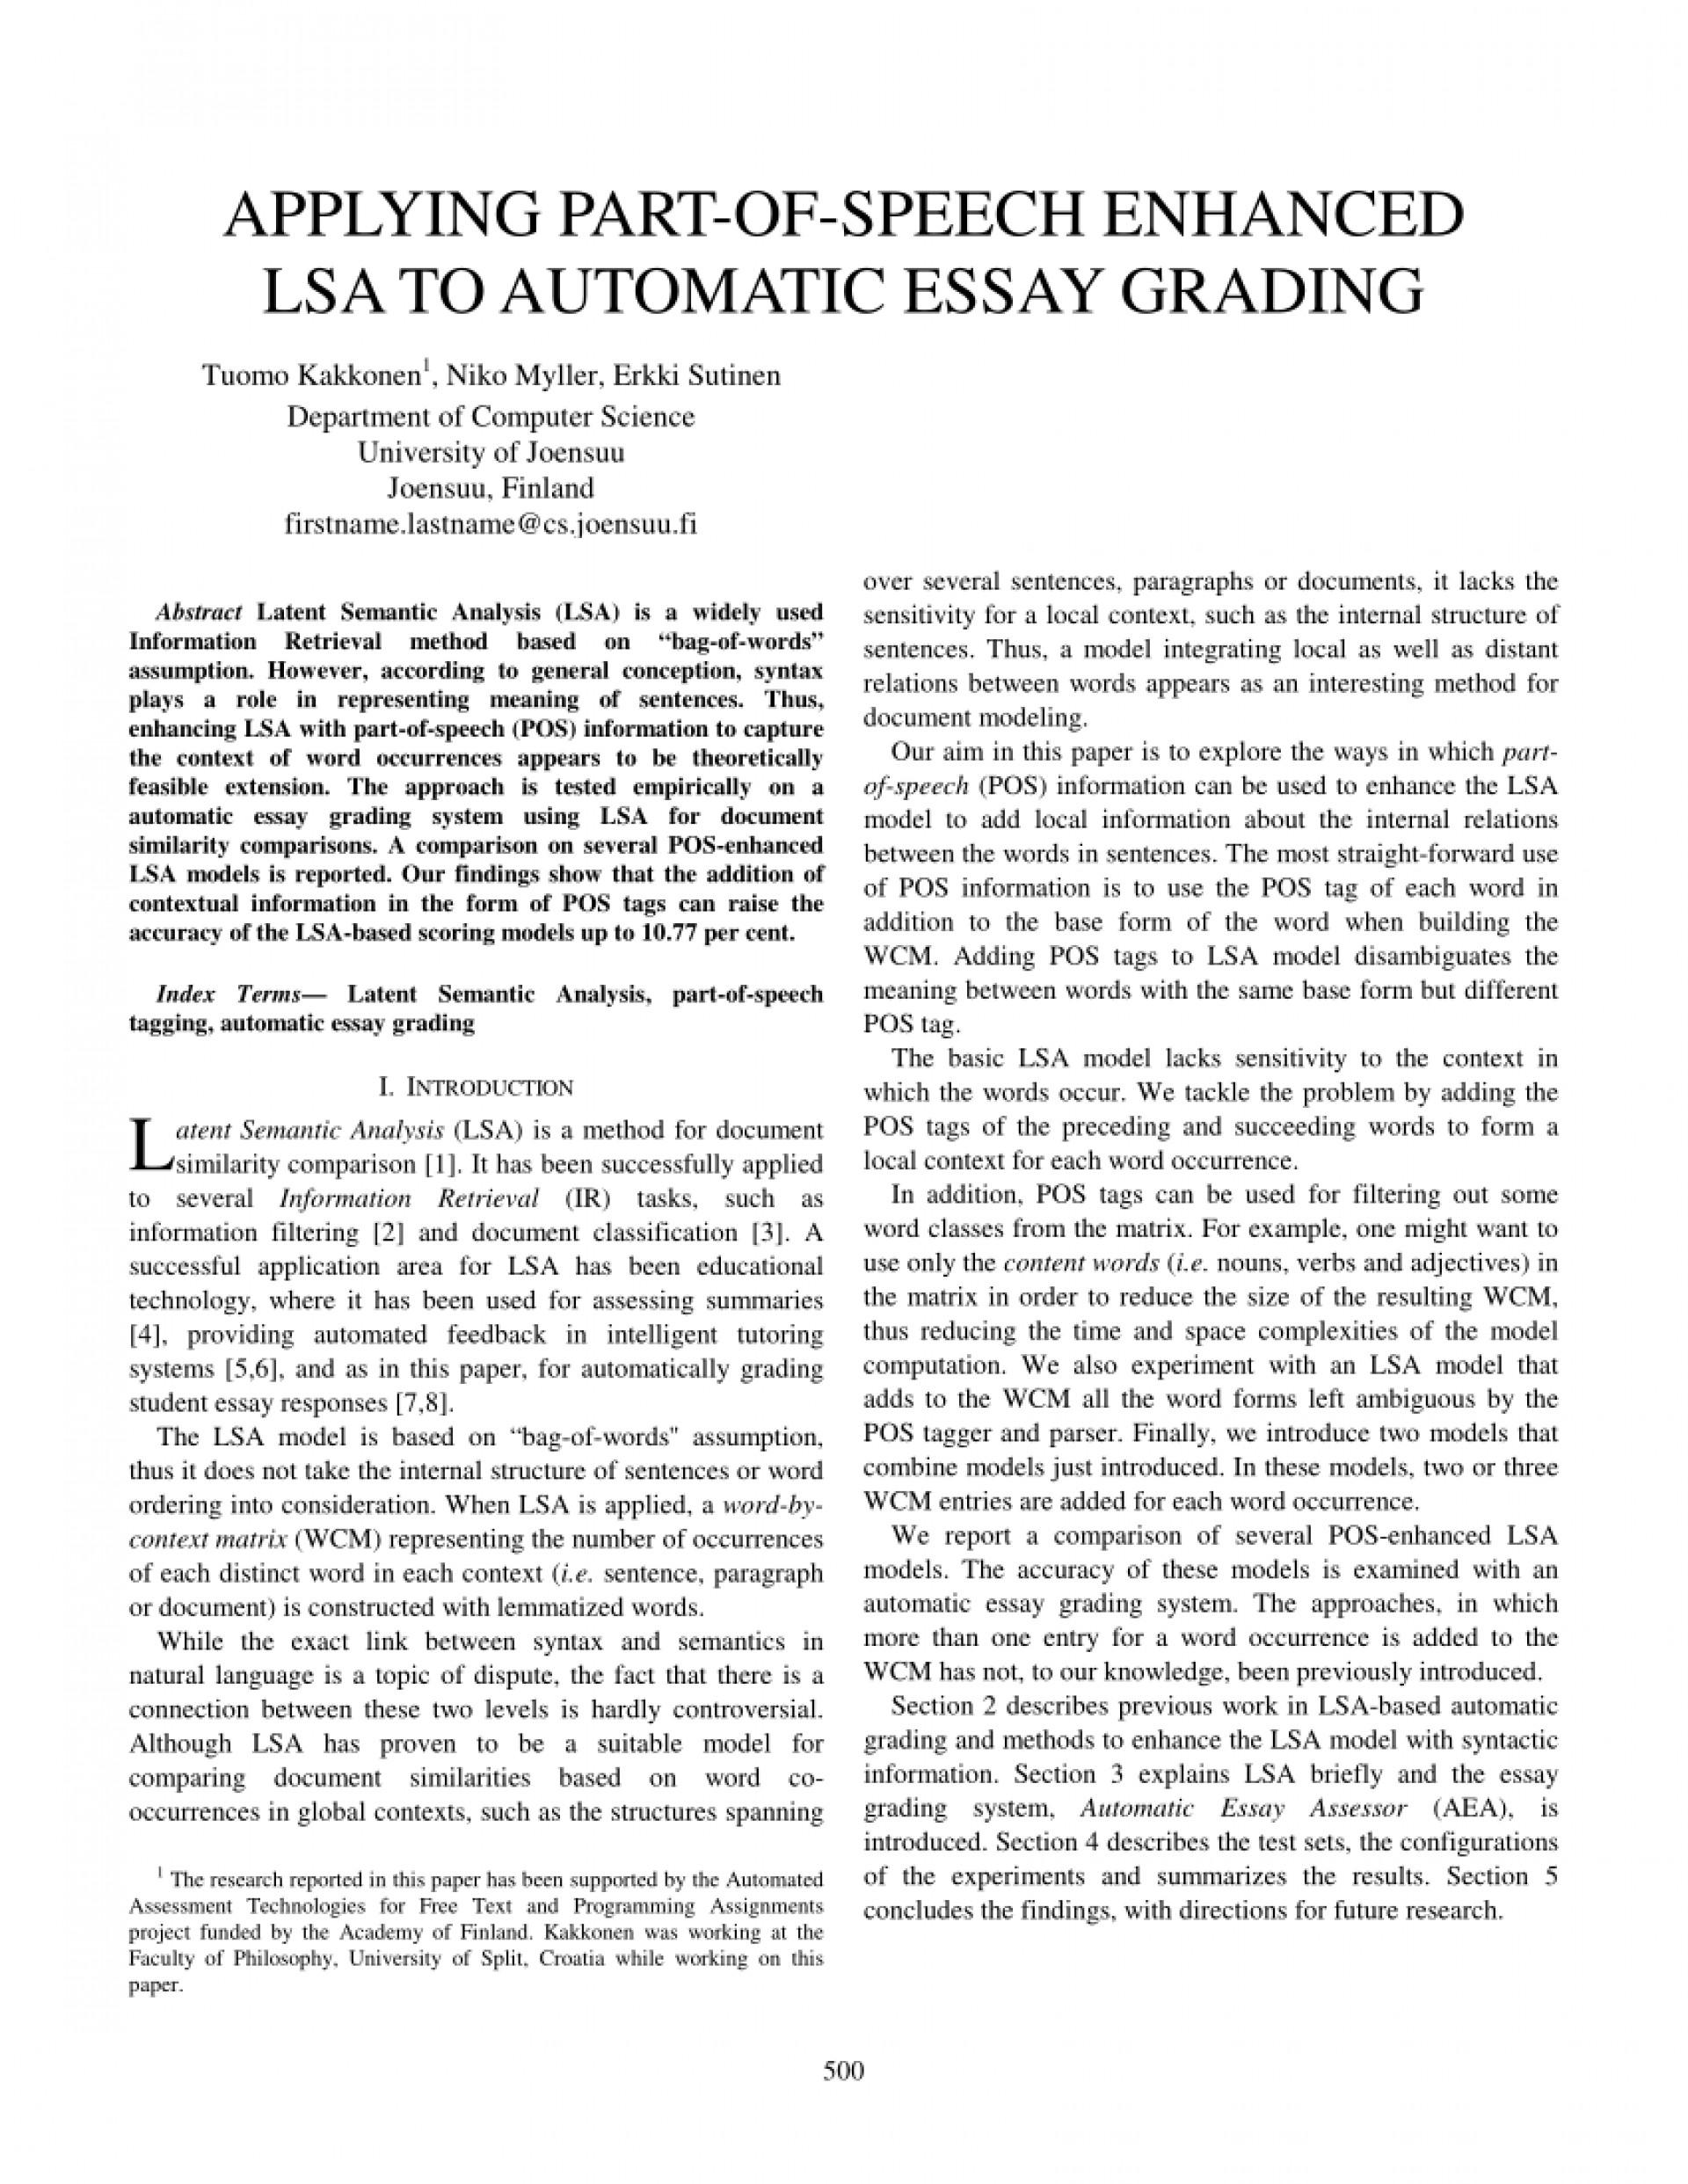 007 Automatic Essay Grader Free Example Singular 1920